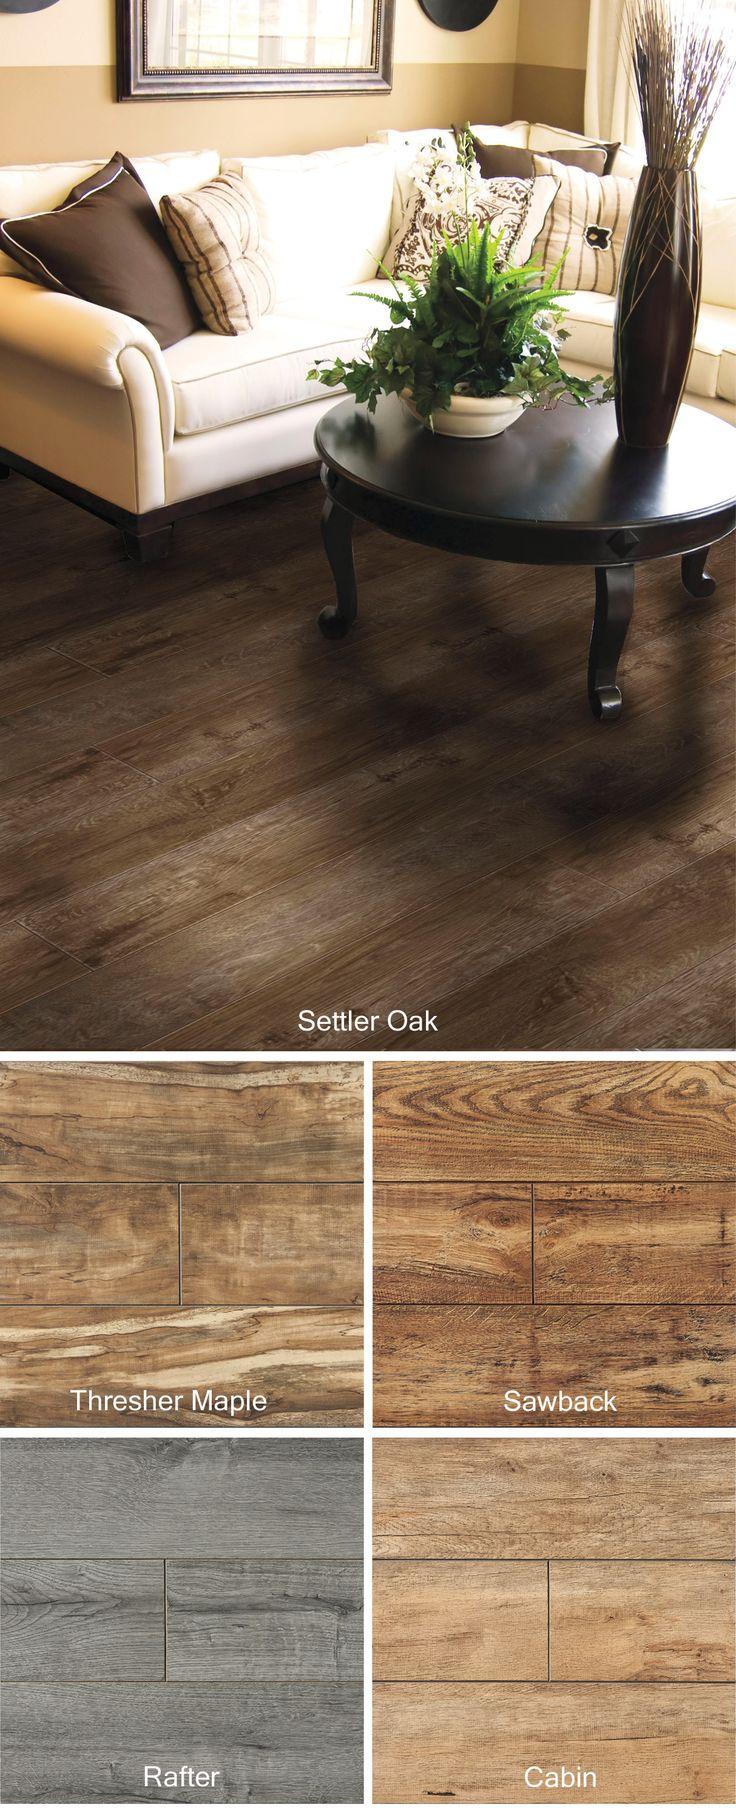 This Beautiful Heritage Settler Oak Laminate Flooring Is